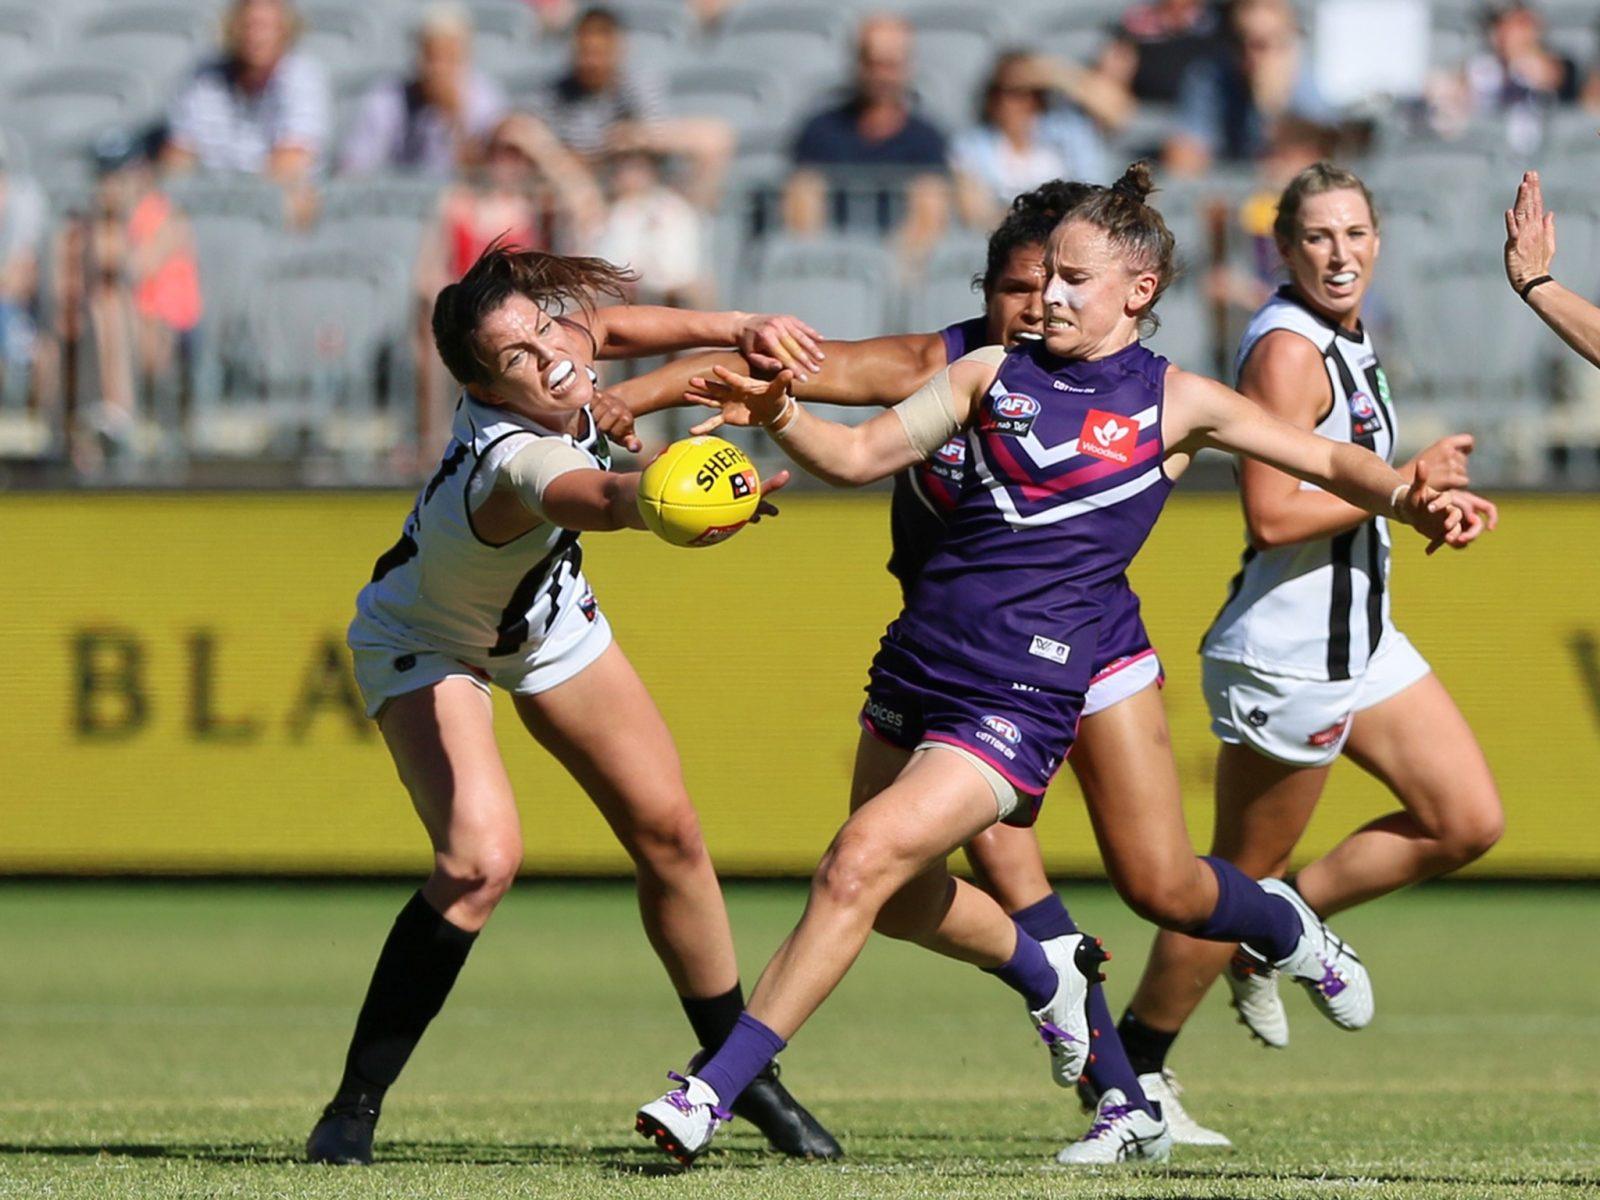 NAB AFLW 2019 | Round 3, Fremantle, Western Australia